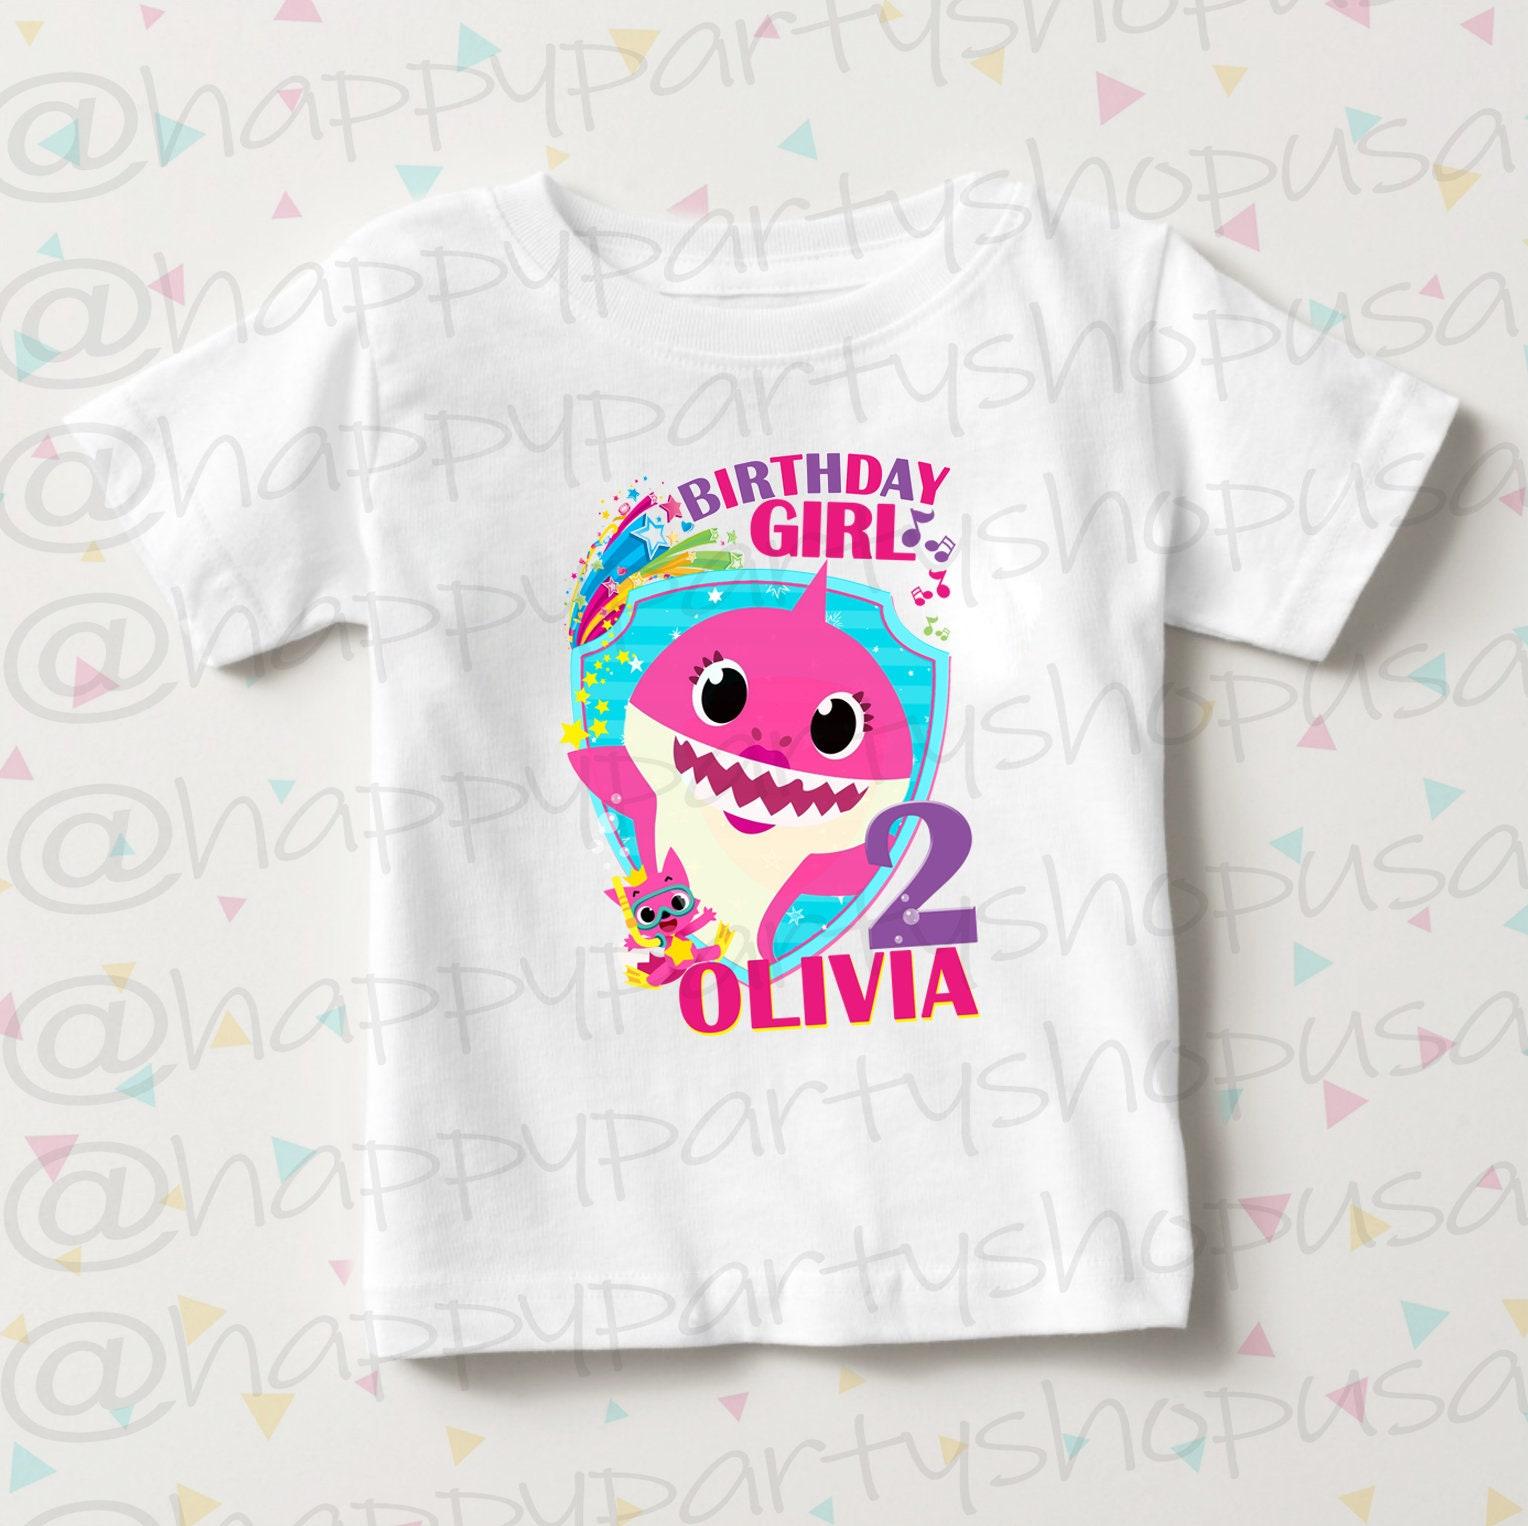 Unisex Baby Cute Tee God Dad Shark Family Matching T-Shirt 6M-24M